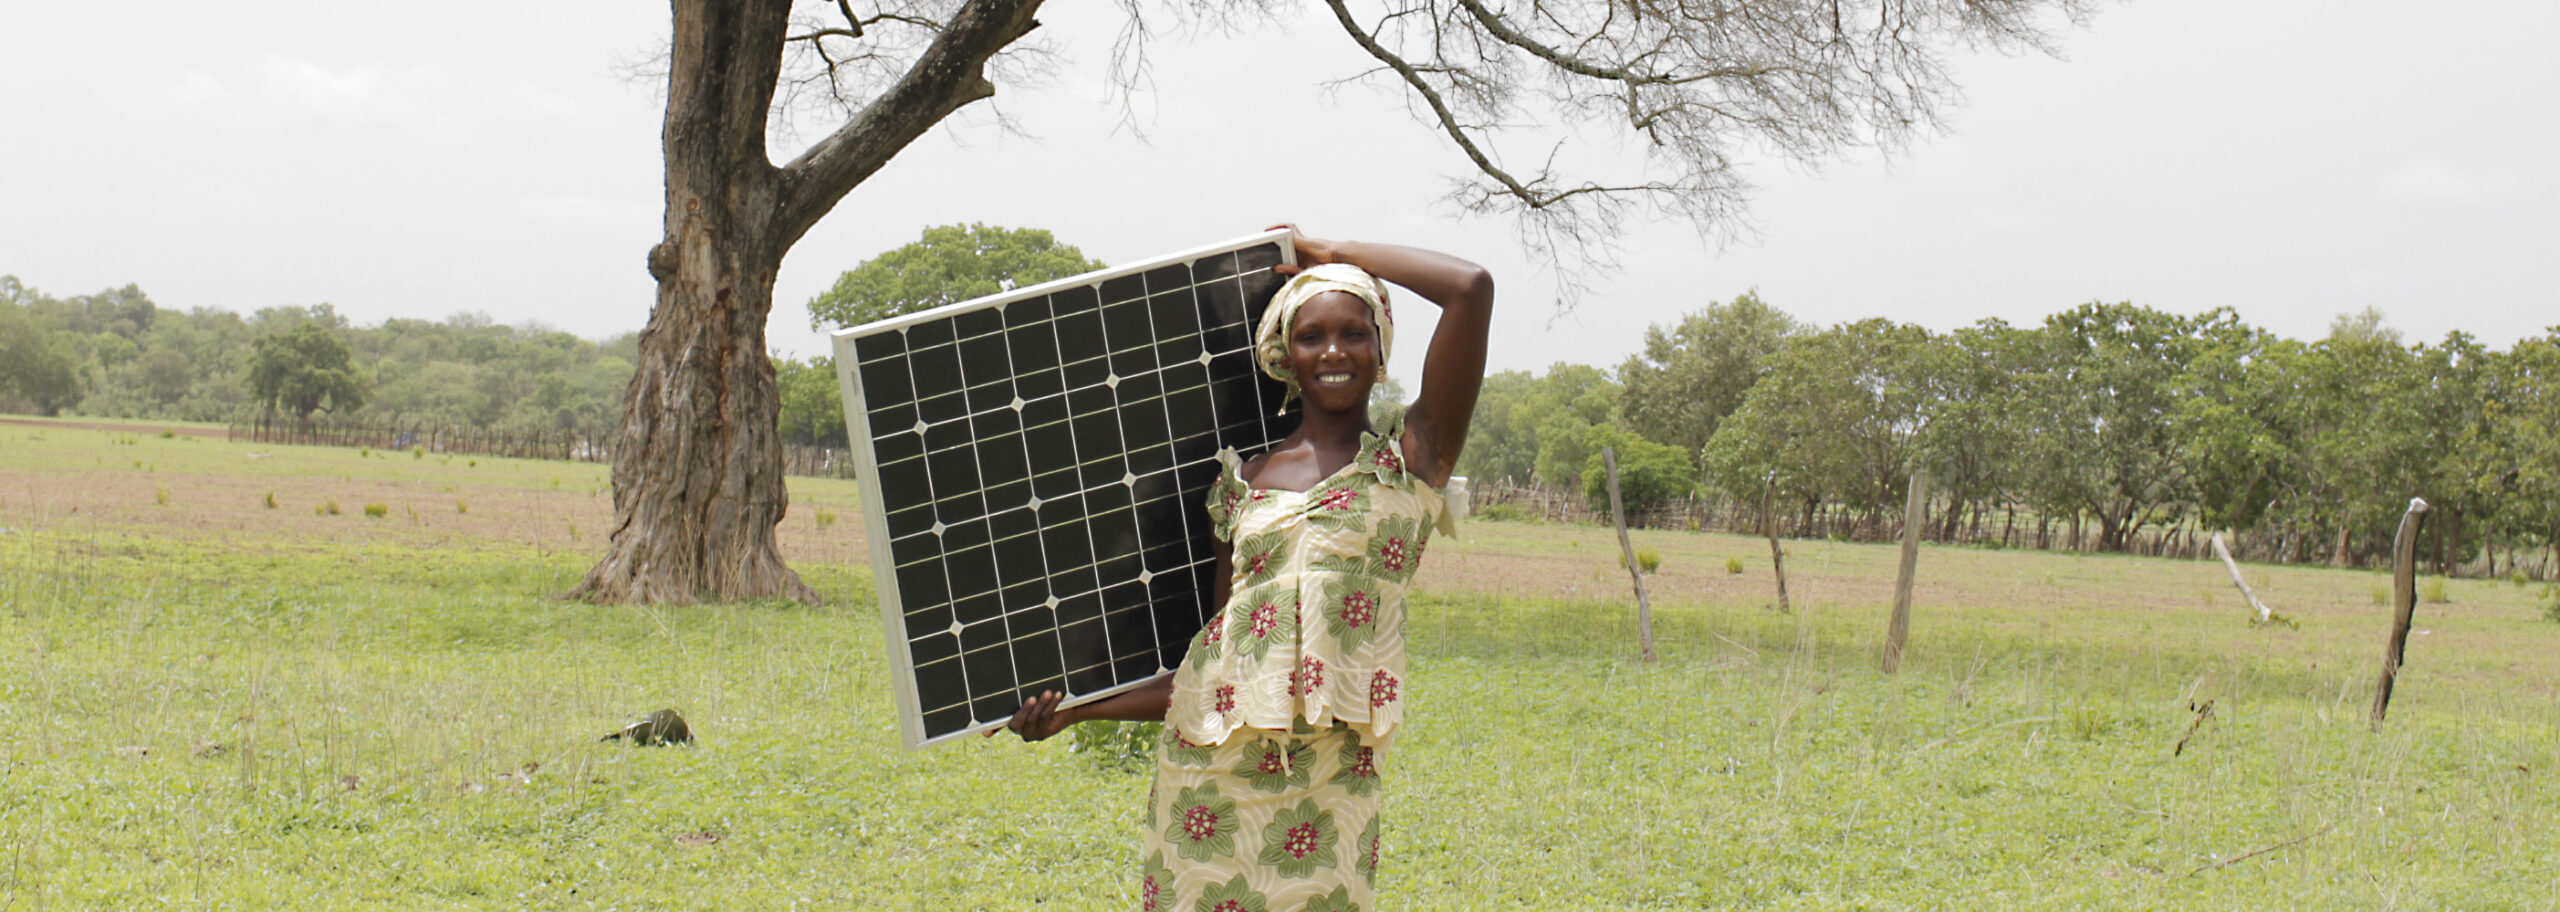 decentralized renewable energy & women entrepreneurship